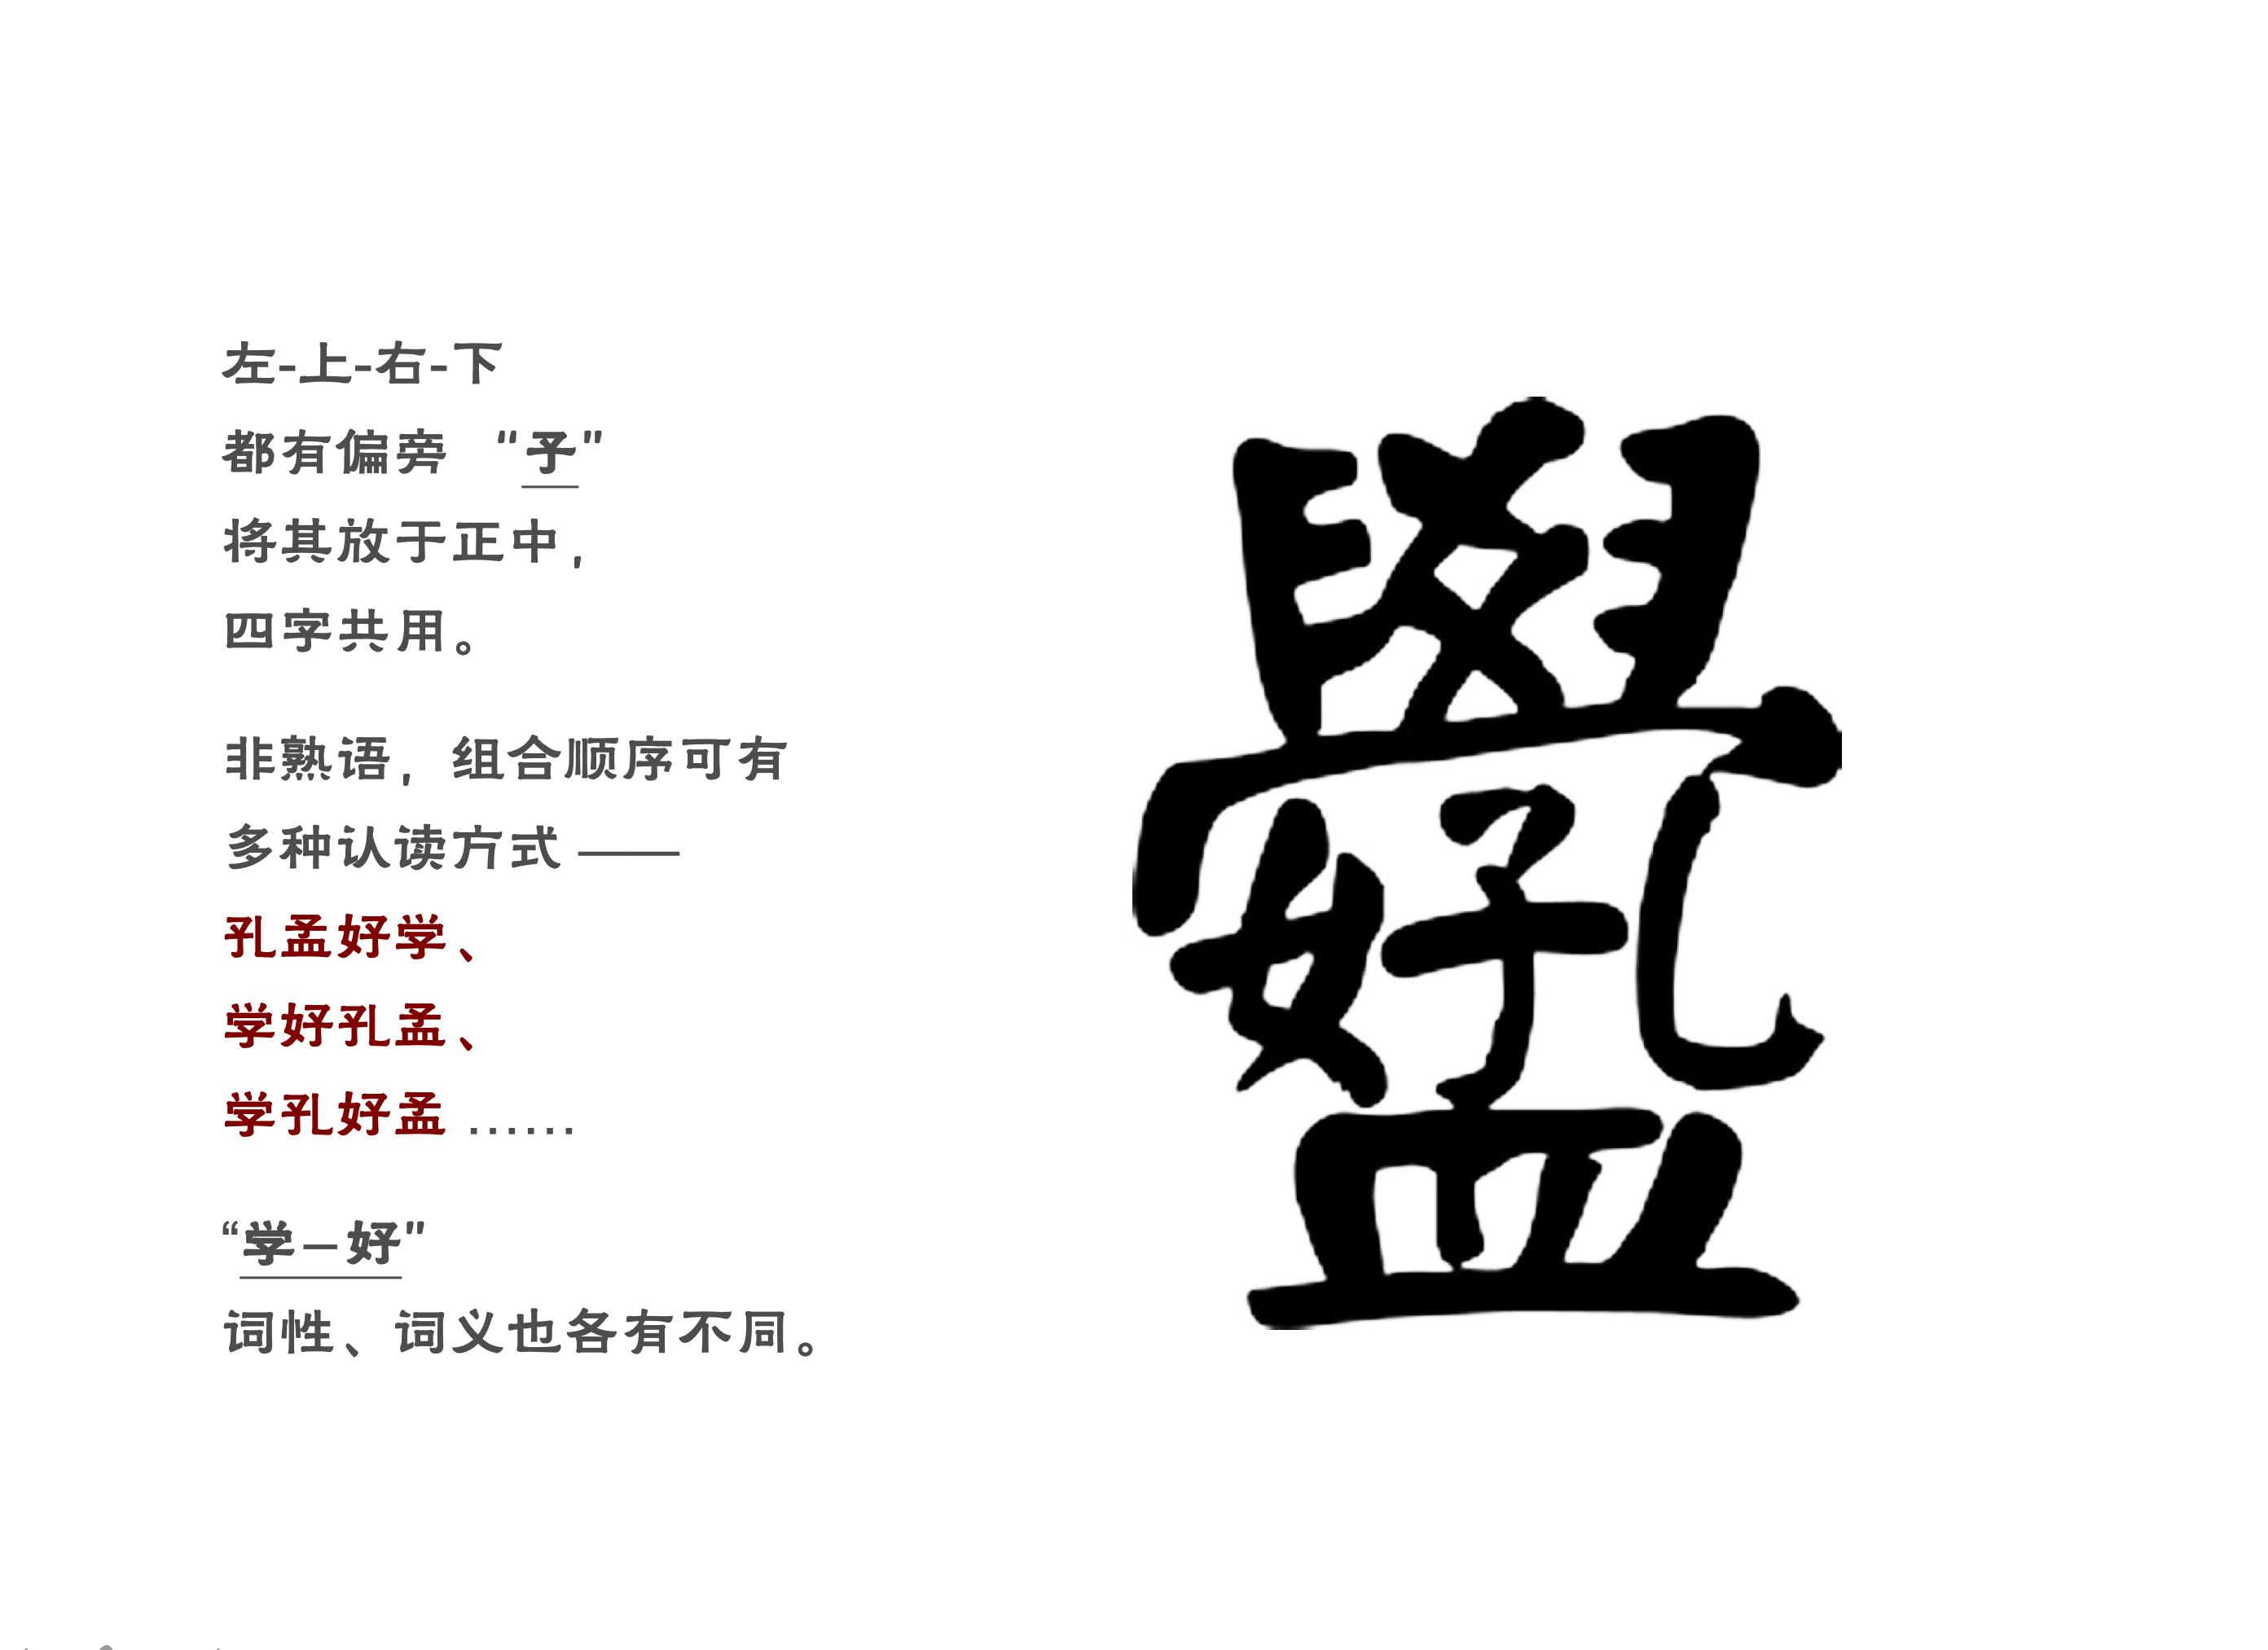 https://ft-bk1.oss-cn-zhangjiakou.aliyuncs.com/Public/Uploads/img/n_content_20201210110110_1367.png